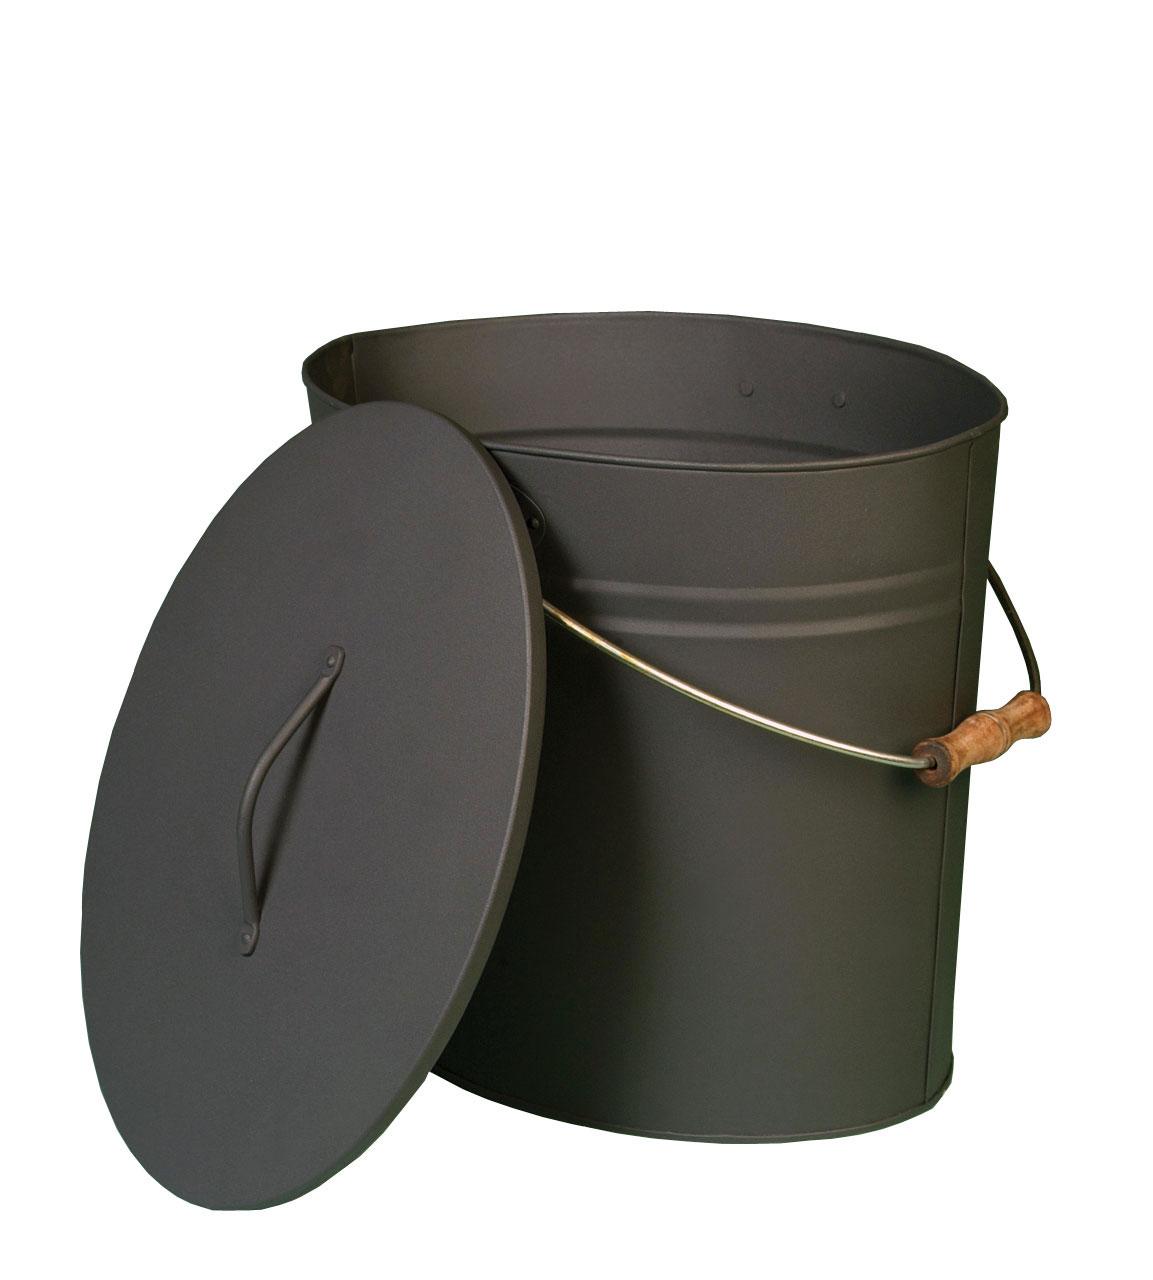 Ascheeimer / Pelleteimer / Kohleeimer Lienbacher oval anthrazit Deckel Bild 1